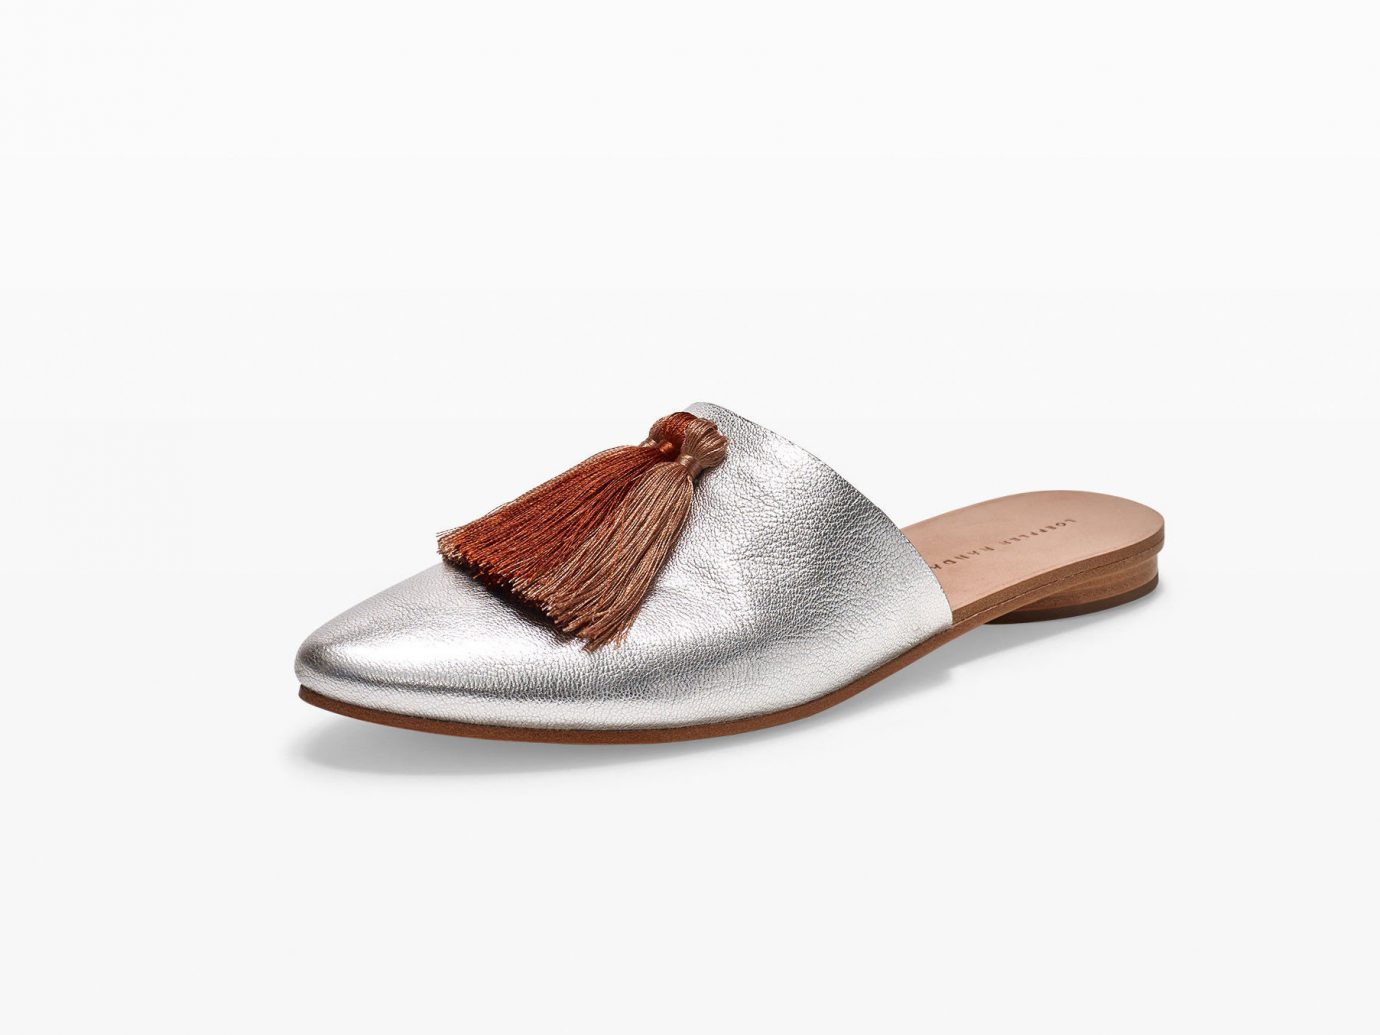 Style + Design footwear shoe brown product leather sandal slipper outdoor shoe textile beige